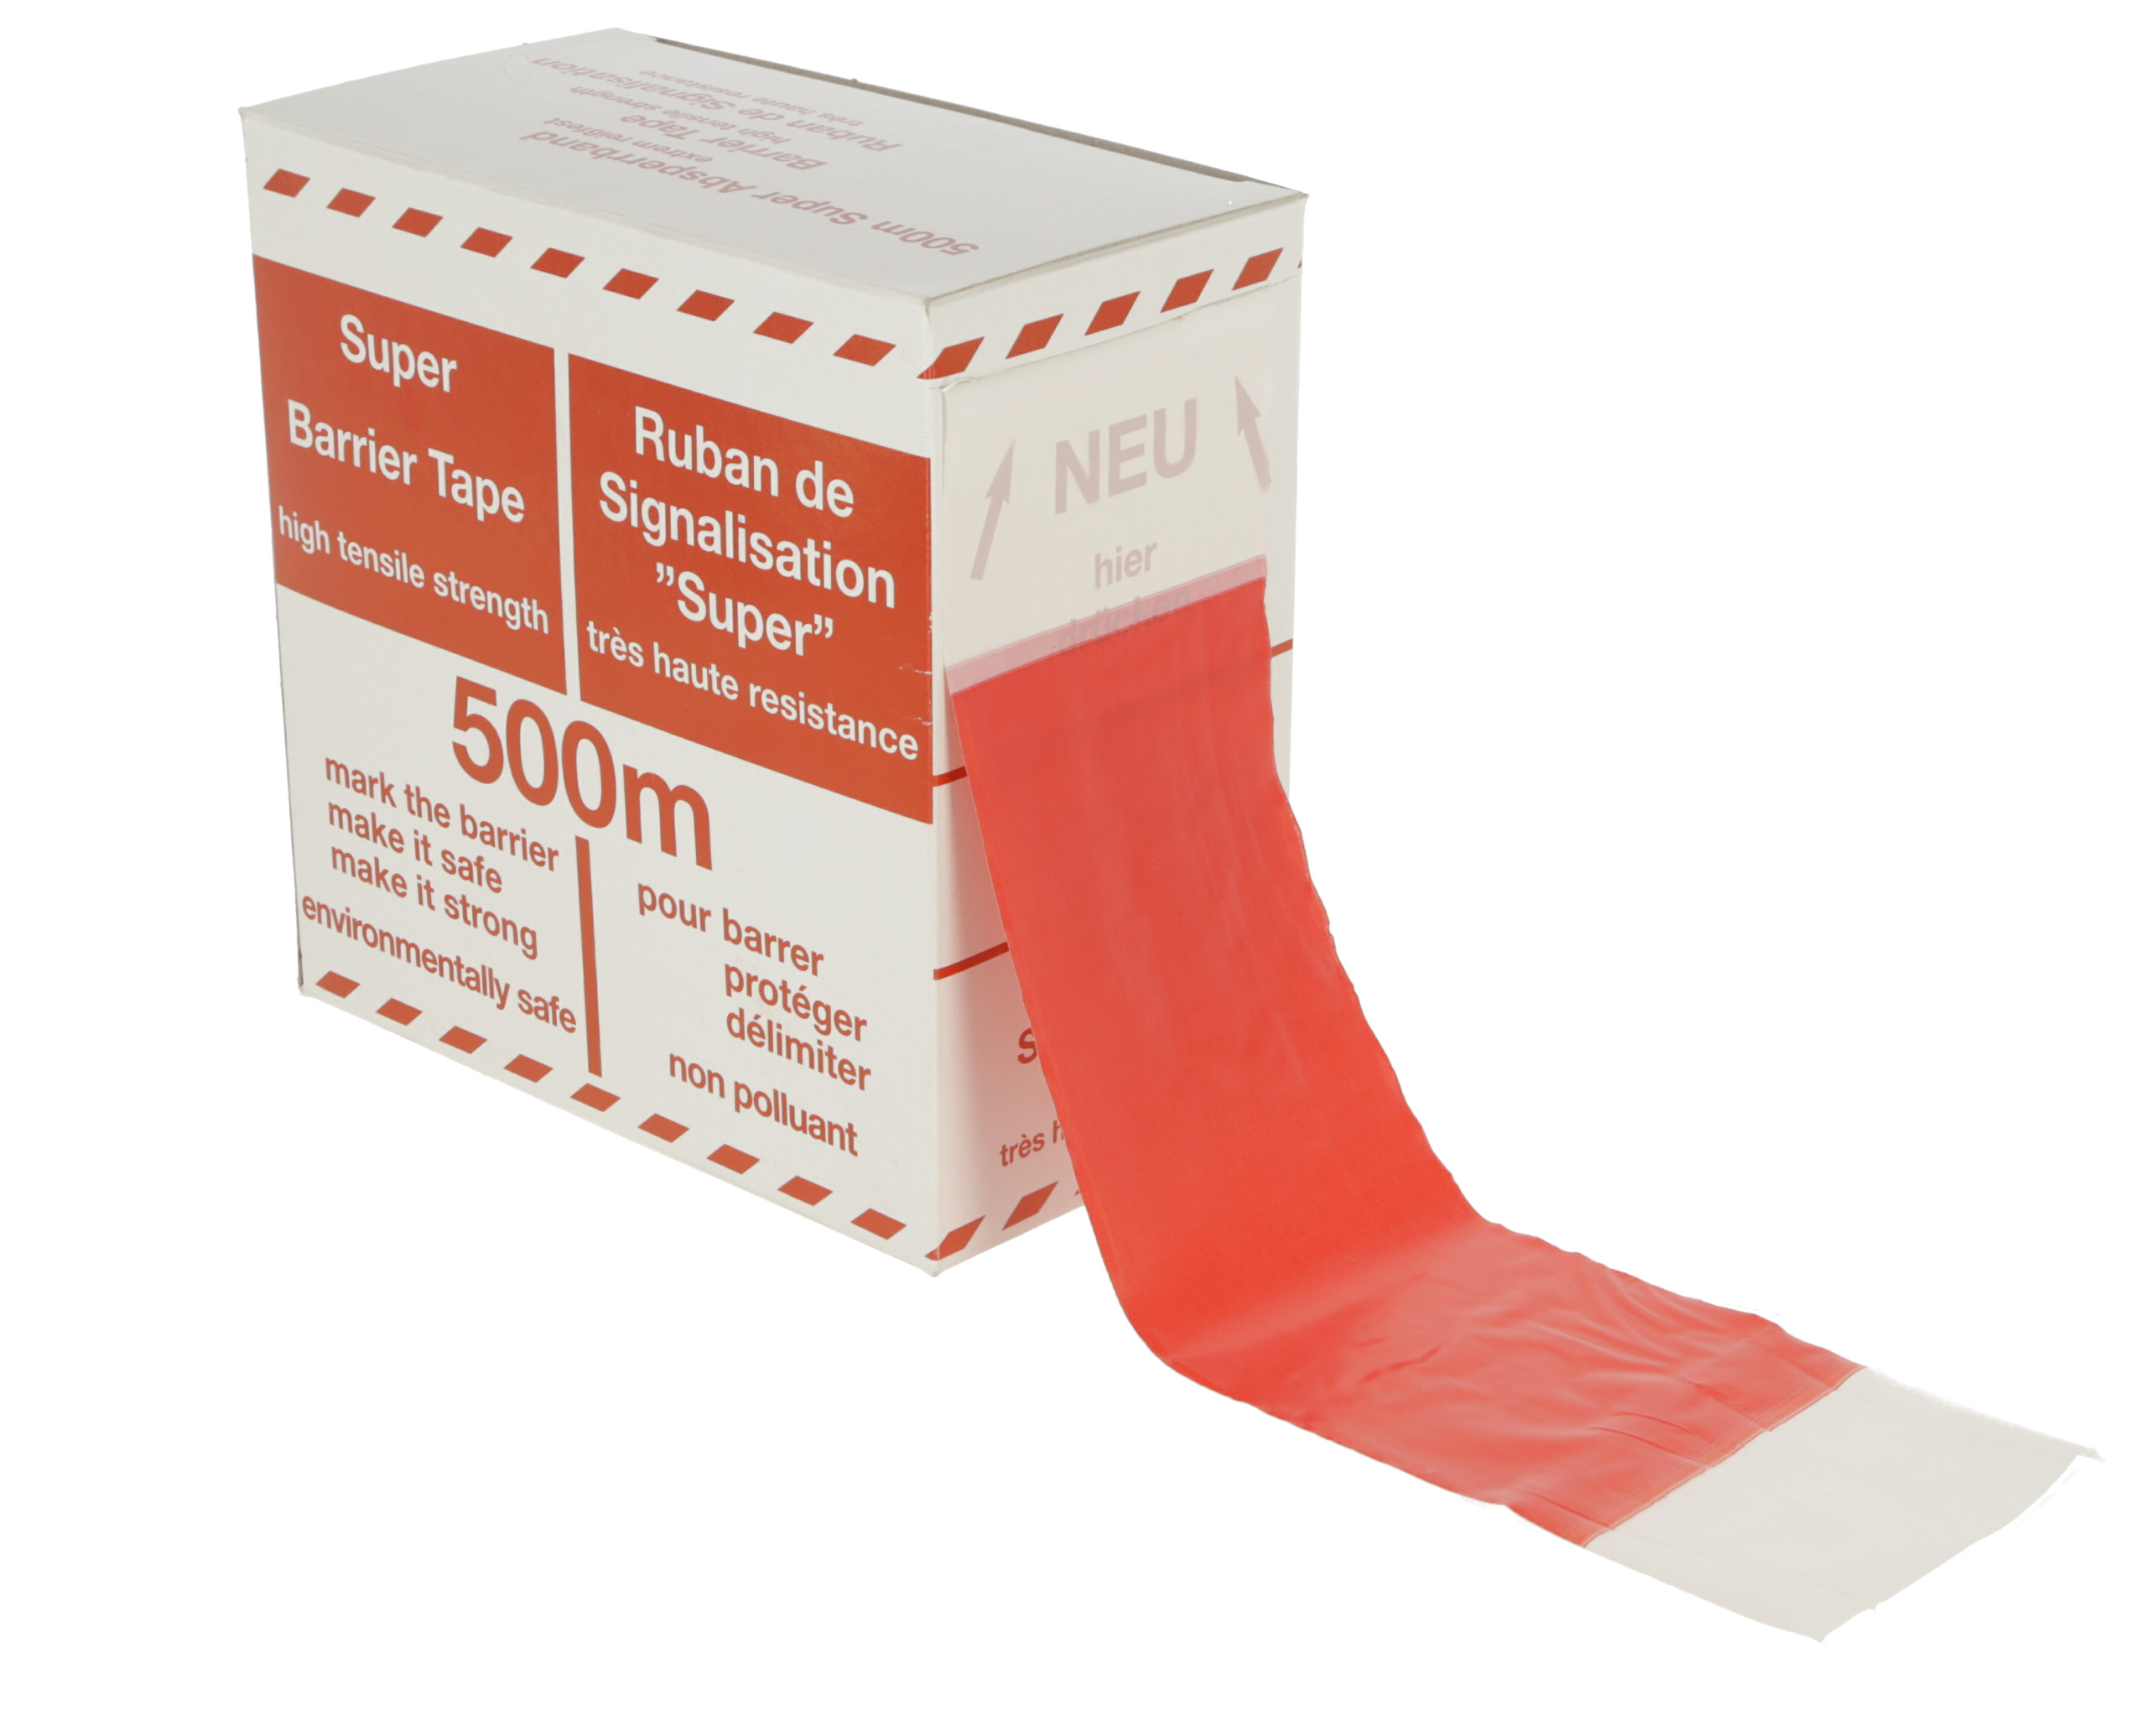 Folien-Absperrband 100m x 80mm rot-weiß geblockt, Abrollbox